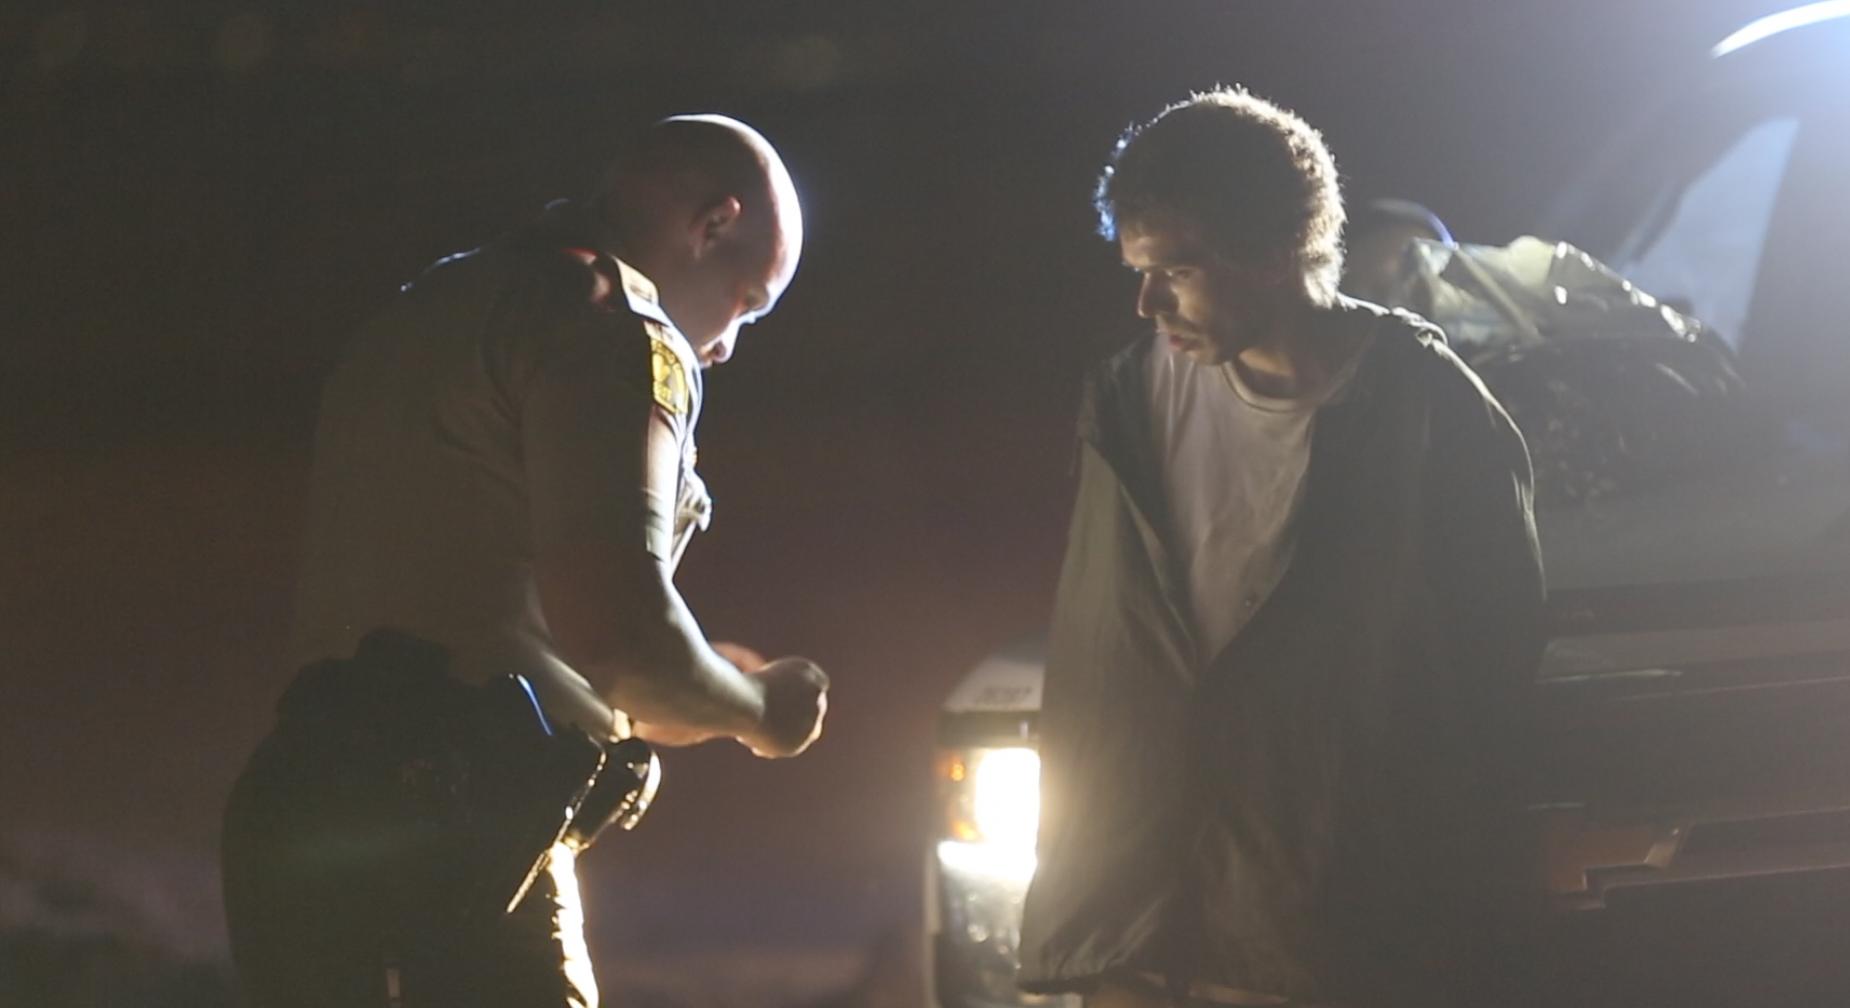 Pursuit suspect arrested by deputies. (Gabriel D. Esoinoza, Victor Valley News)